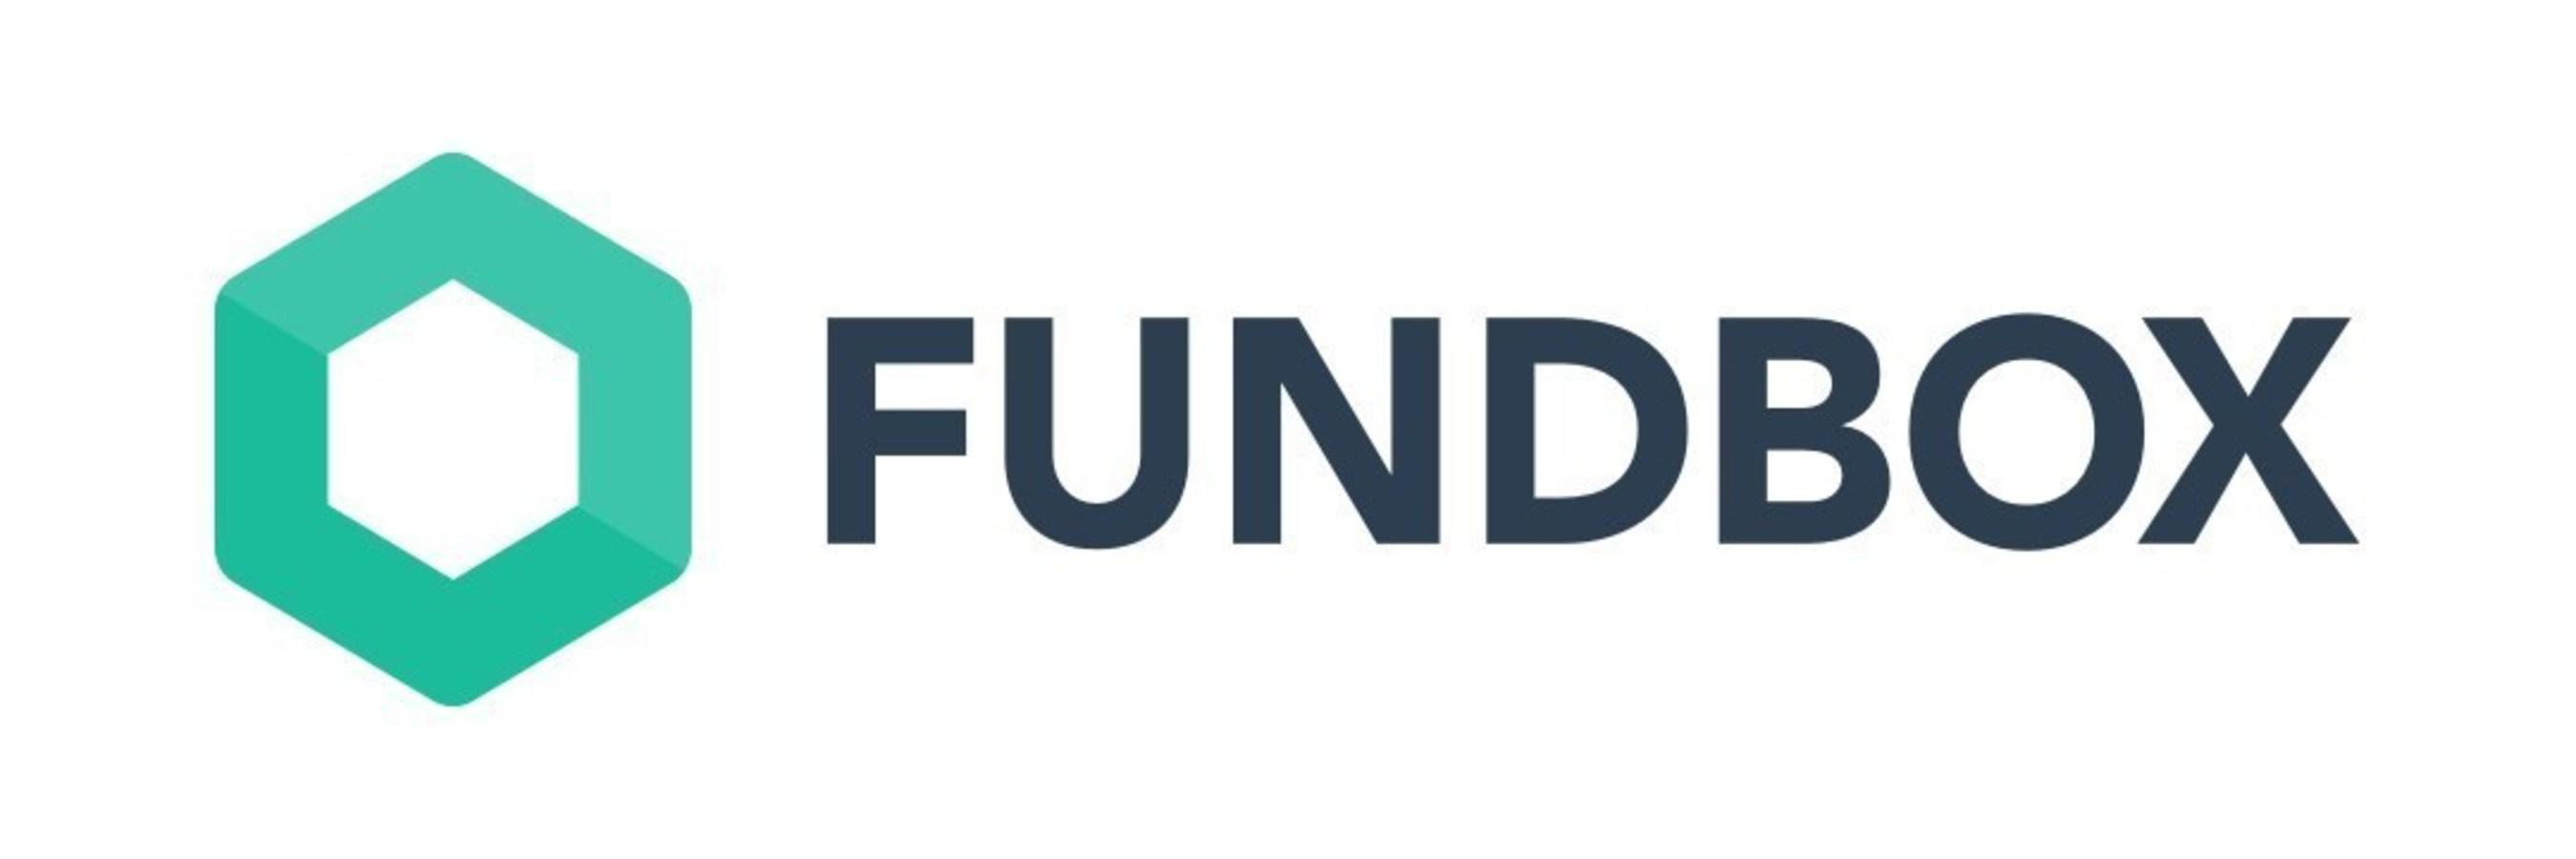 Fundbox Partners With Clio